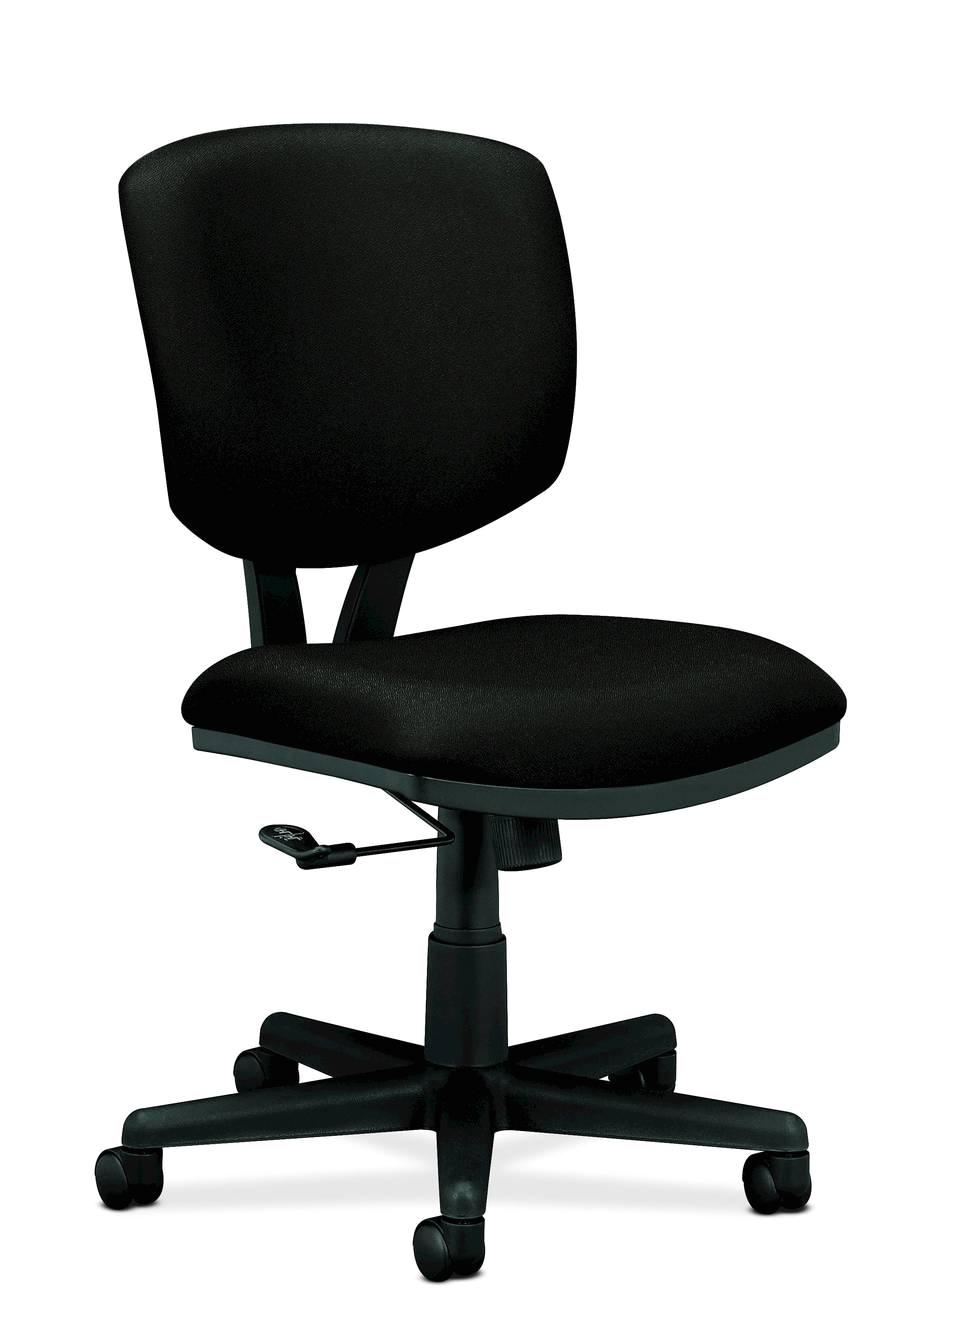 Top 10 Office Chairs Under $500 Hon Volt 5701 Basic Swivel Task Chair 40 H X 25 34 W X 25 34 D Black